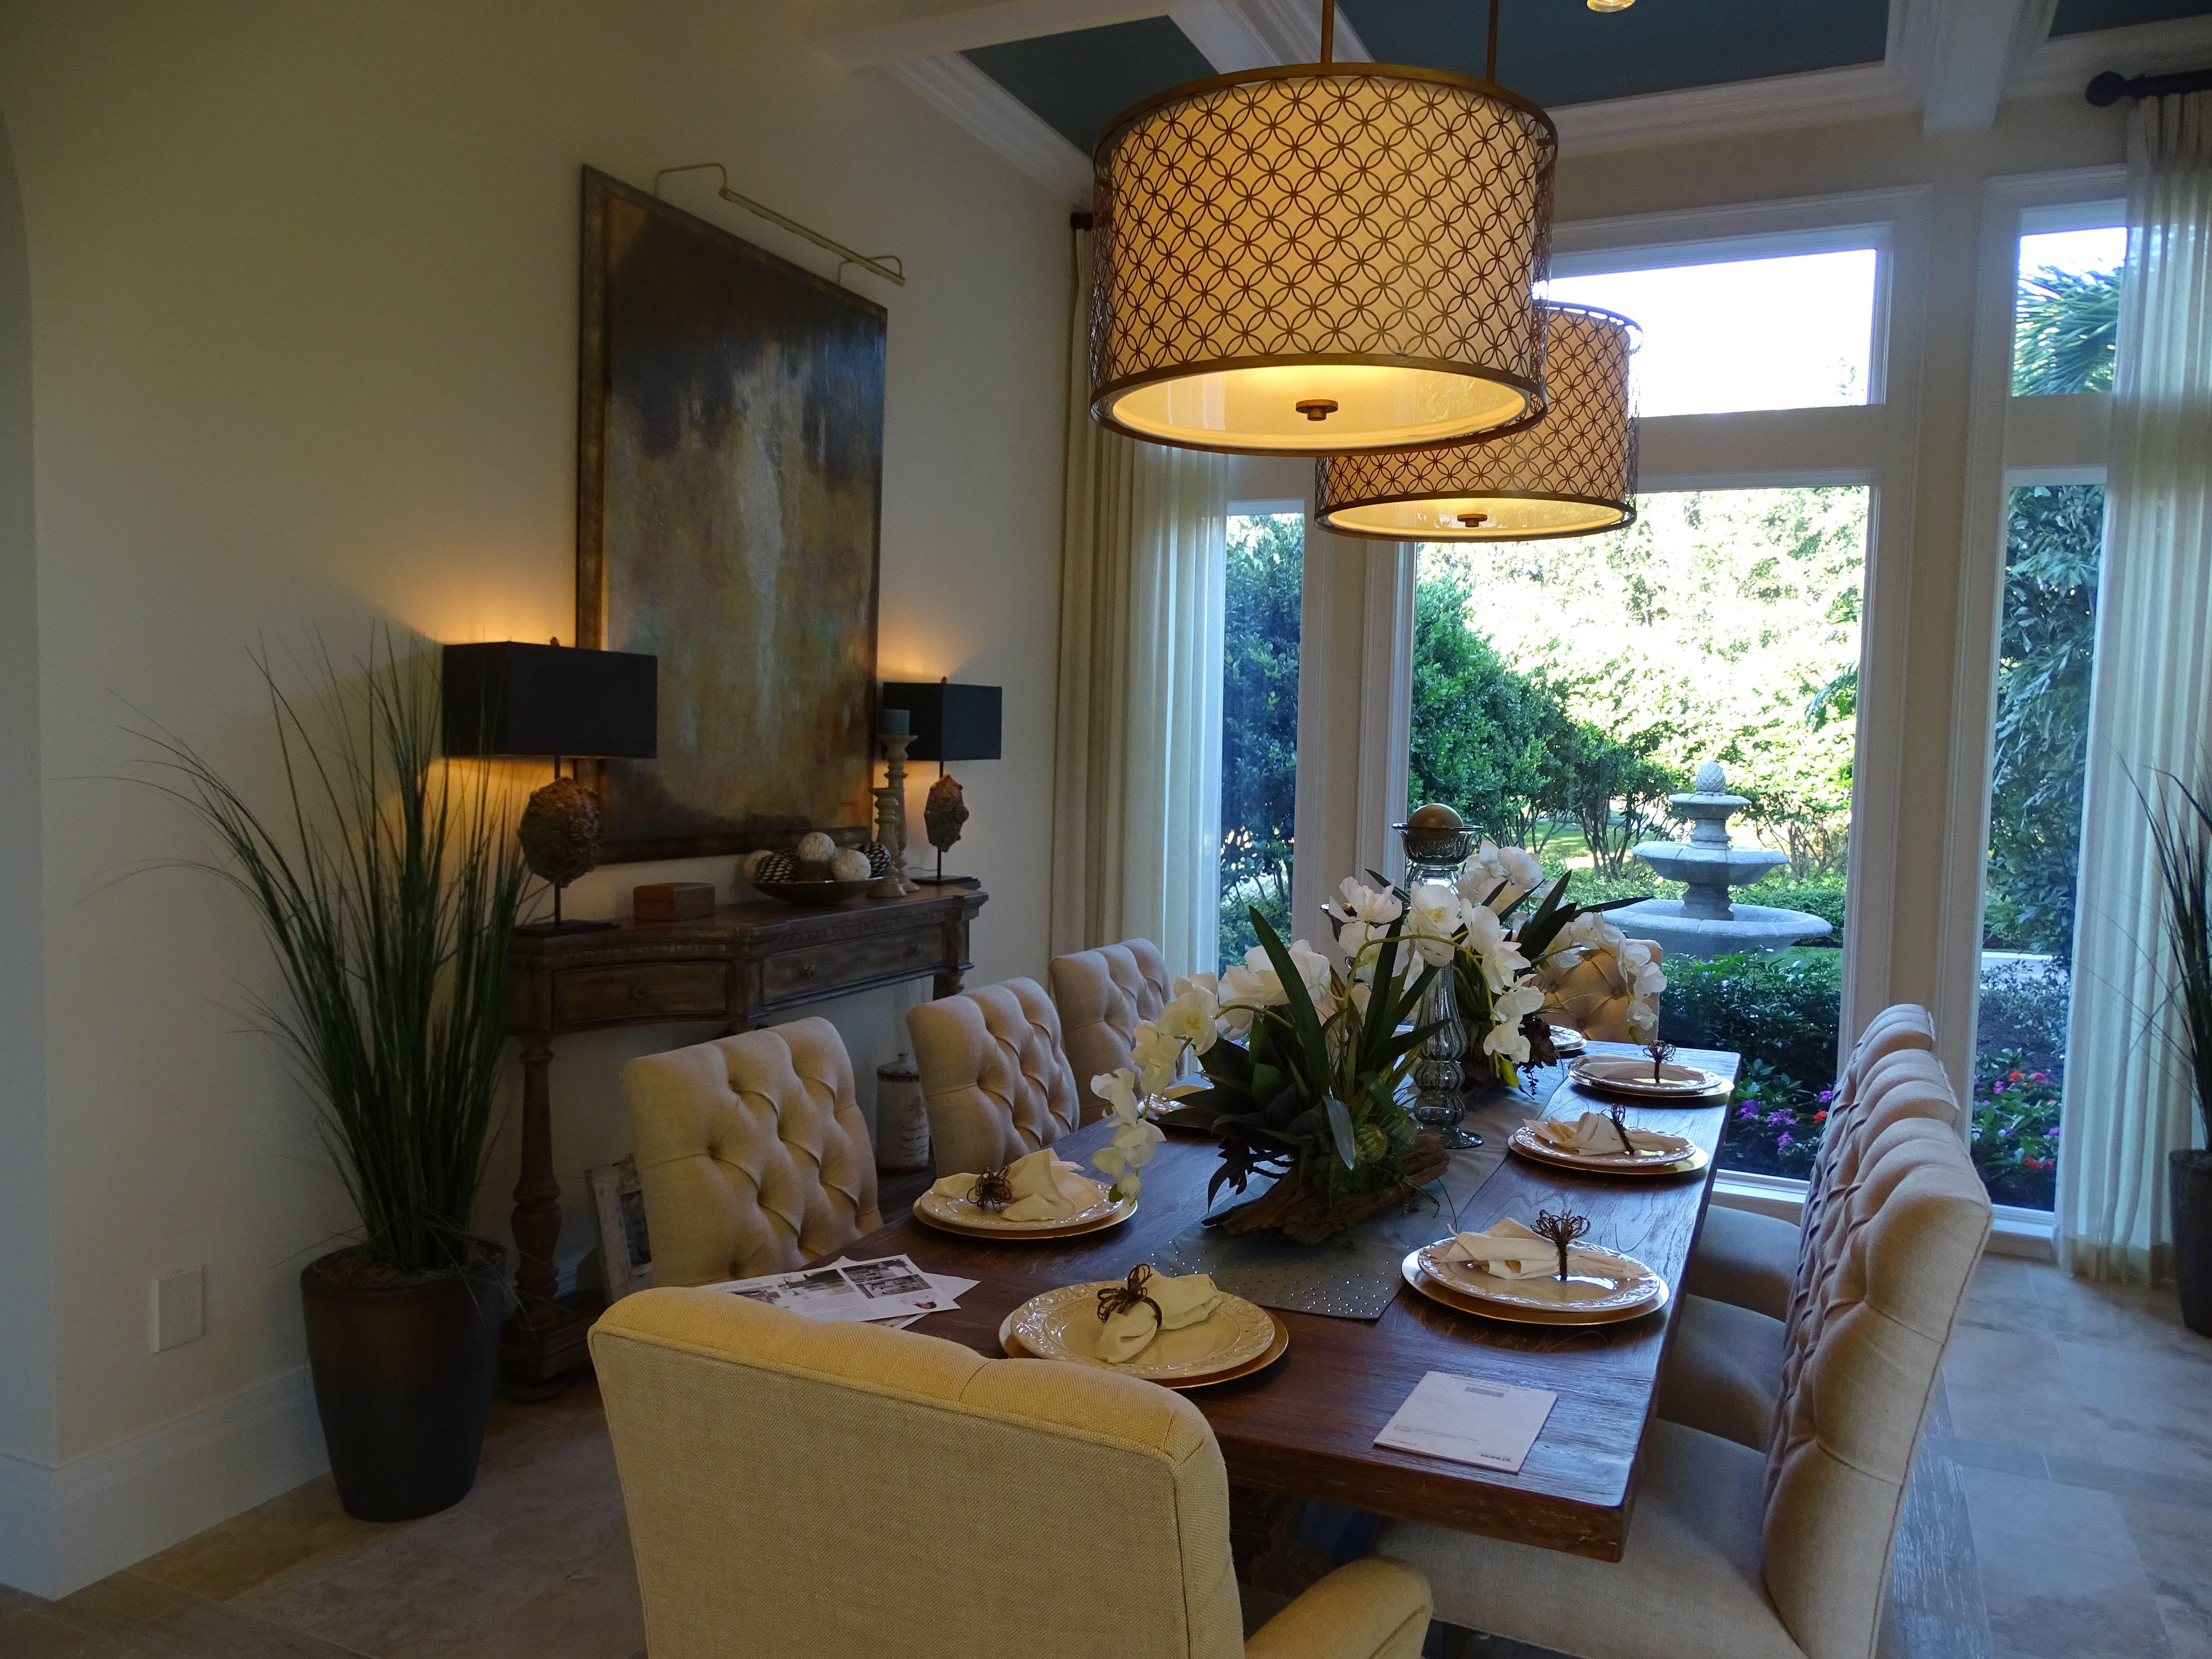 Dining Room  Quail West Model Home  Interior Design By Tricia - Model home interior design